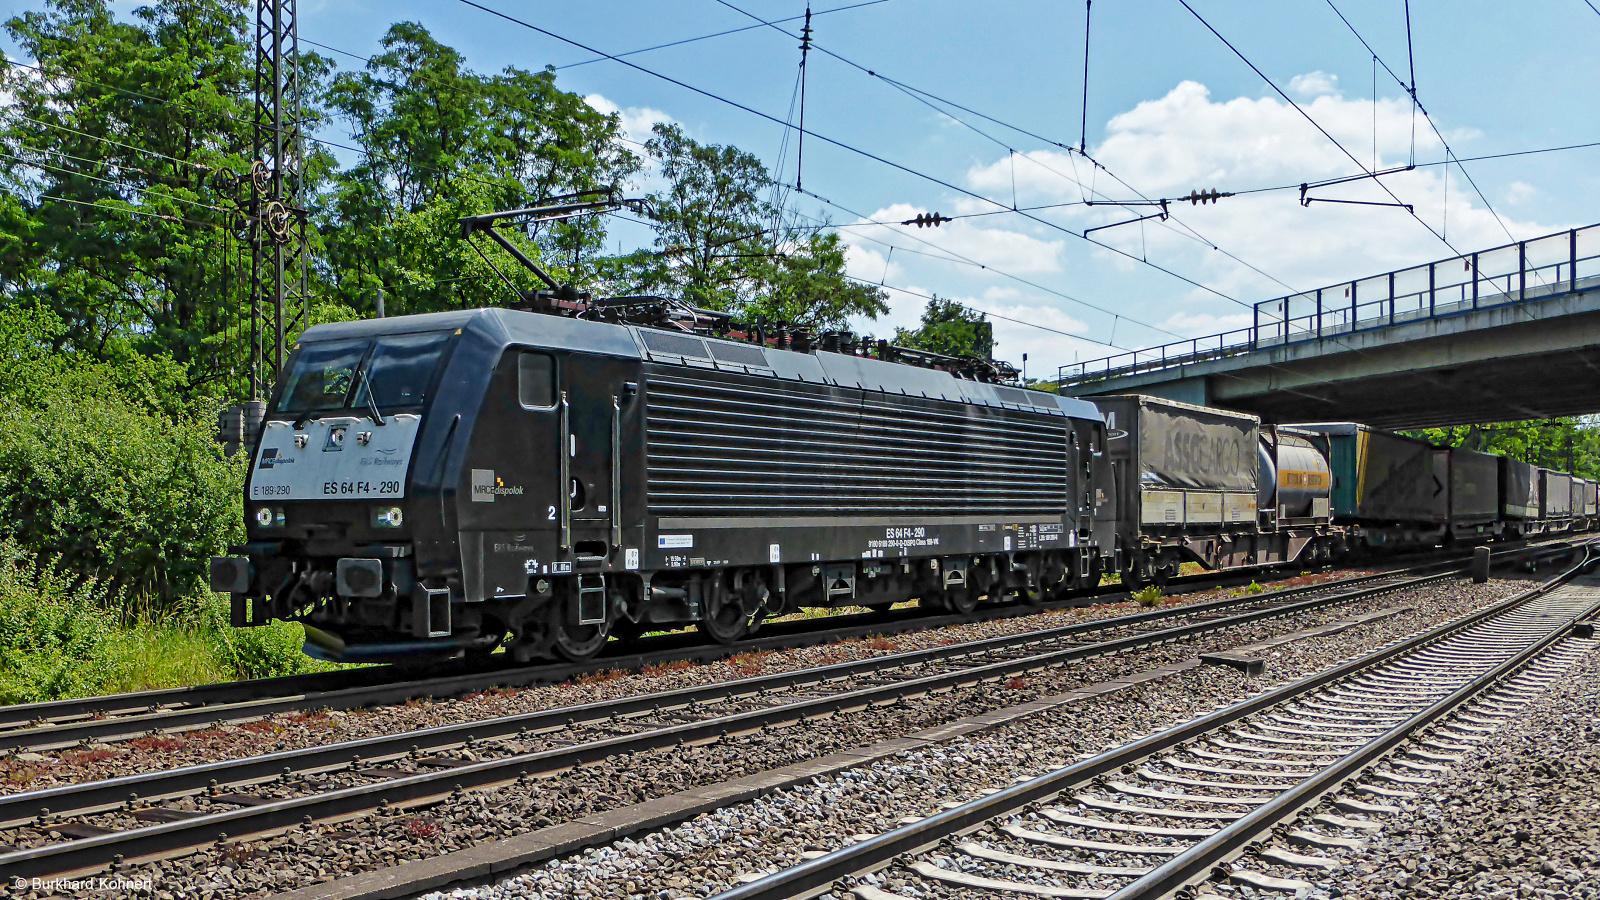 189 290 ES 64 F4-290 MRCE dispolok